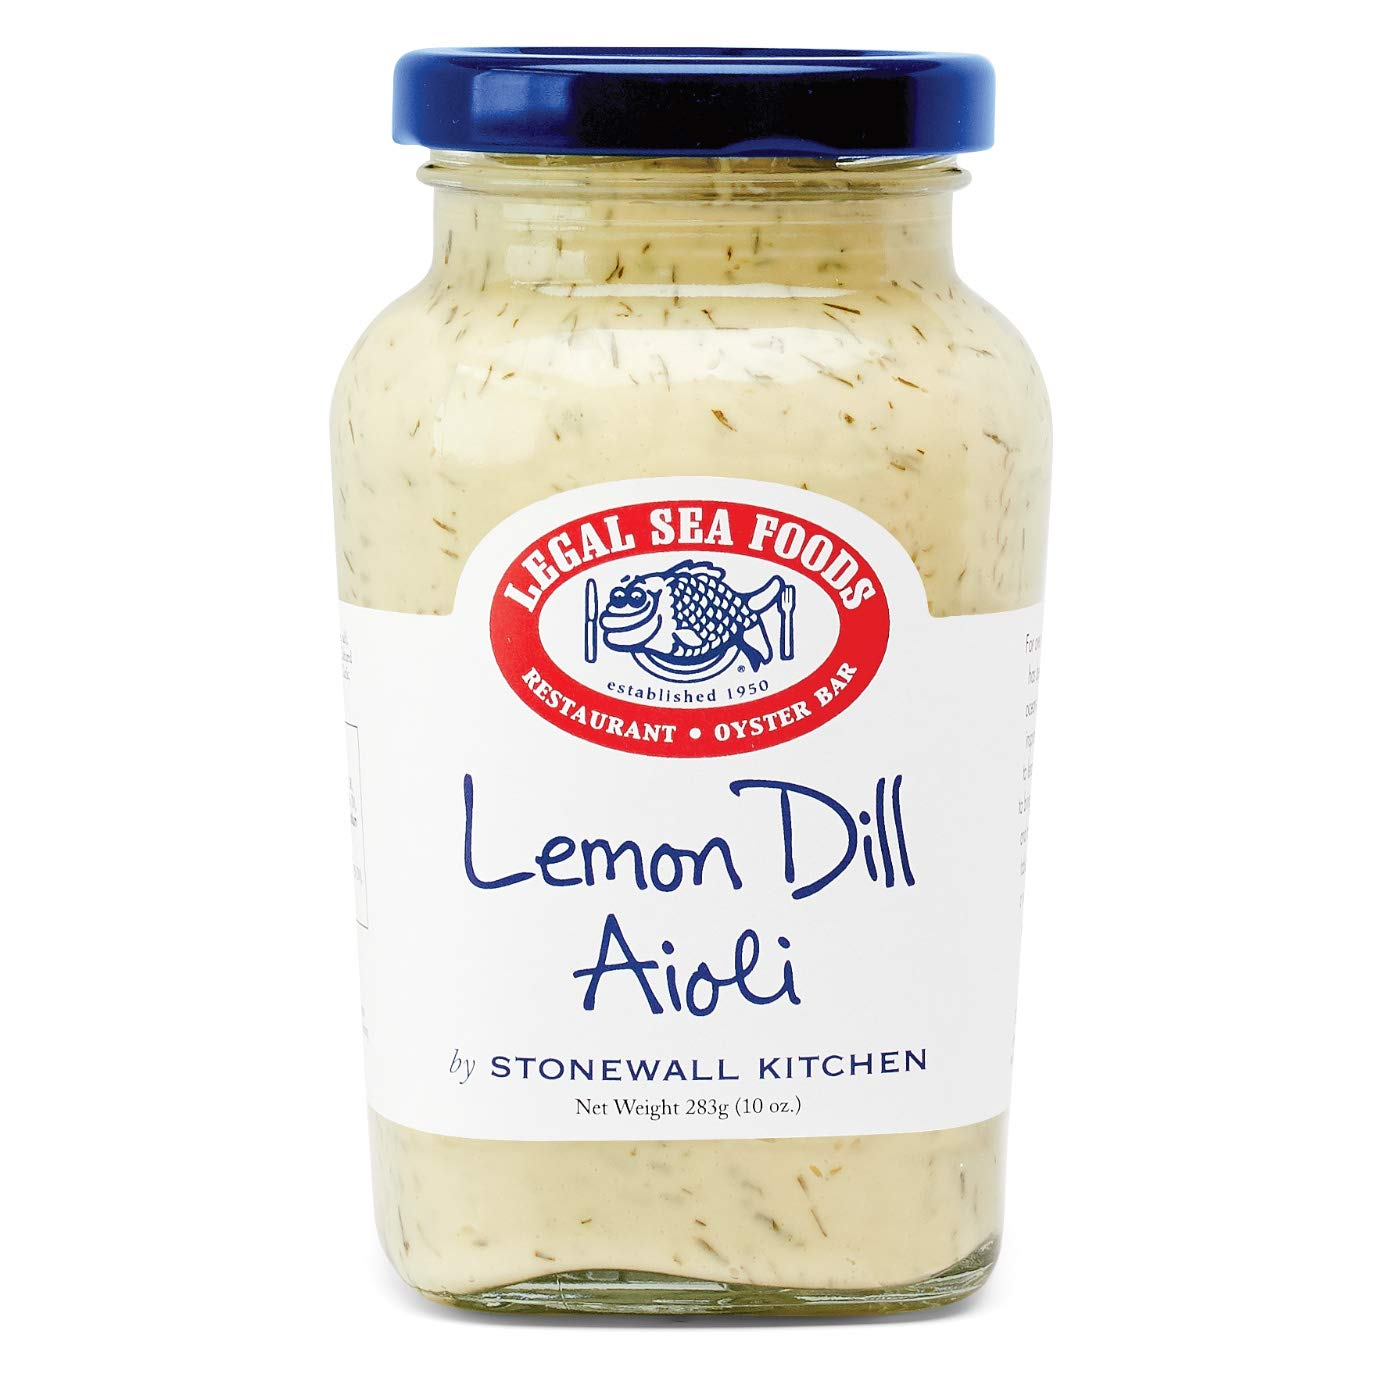 Legal Sea Foods Lemon Dill Aioli, 10 oz